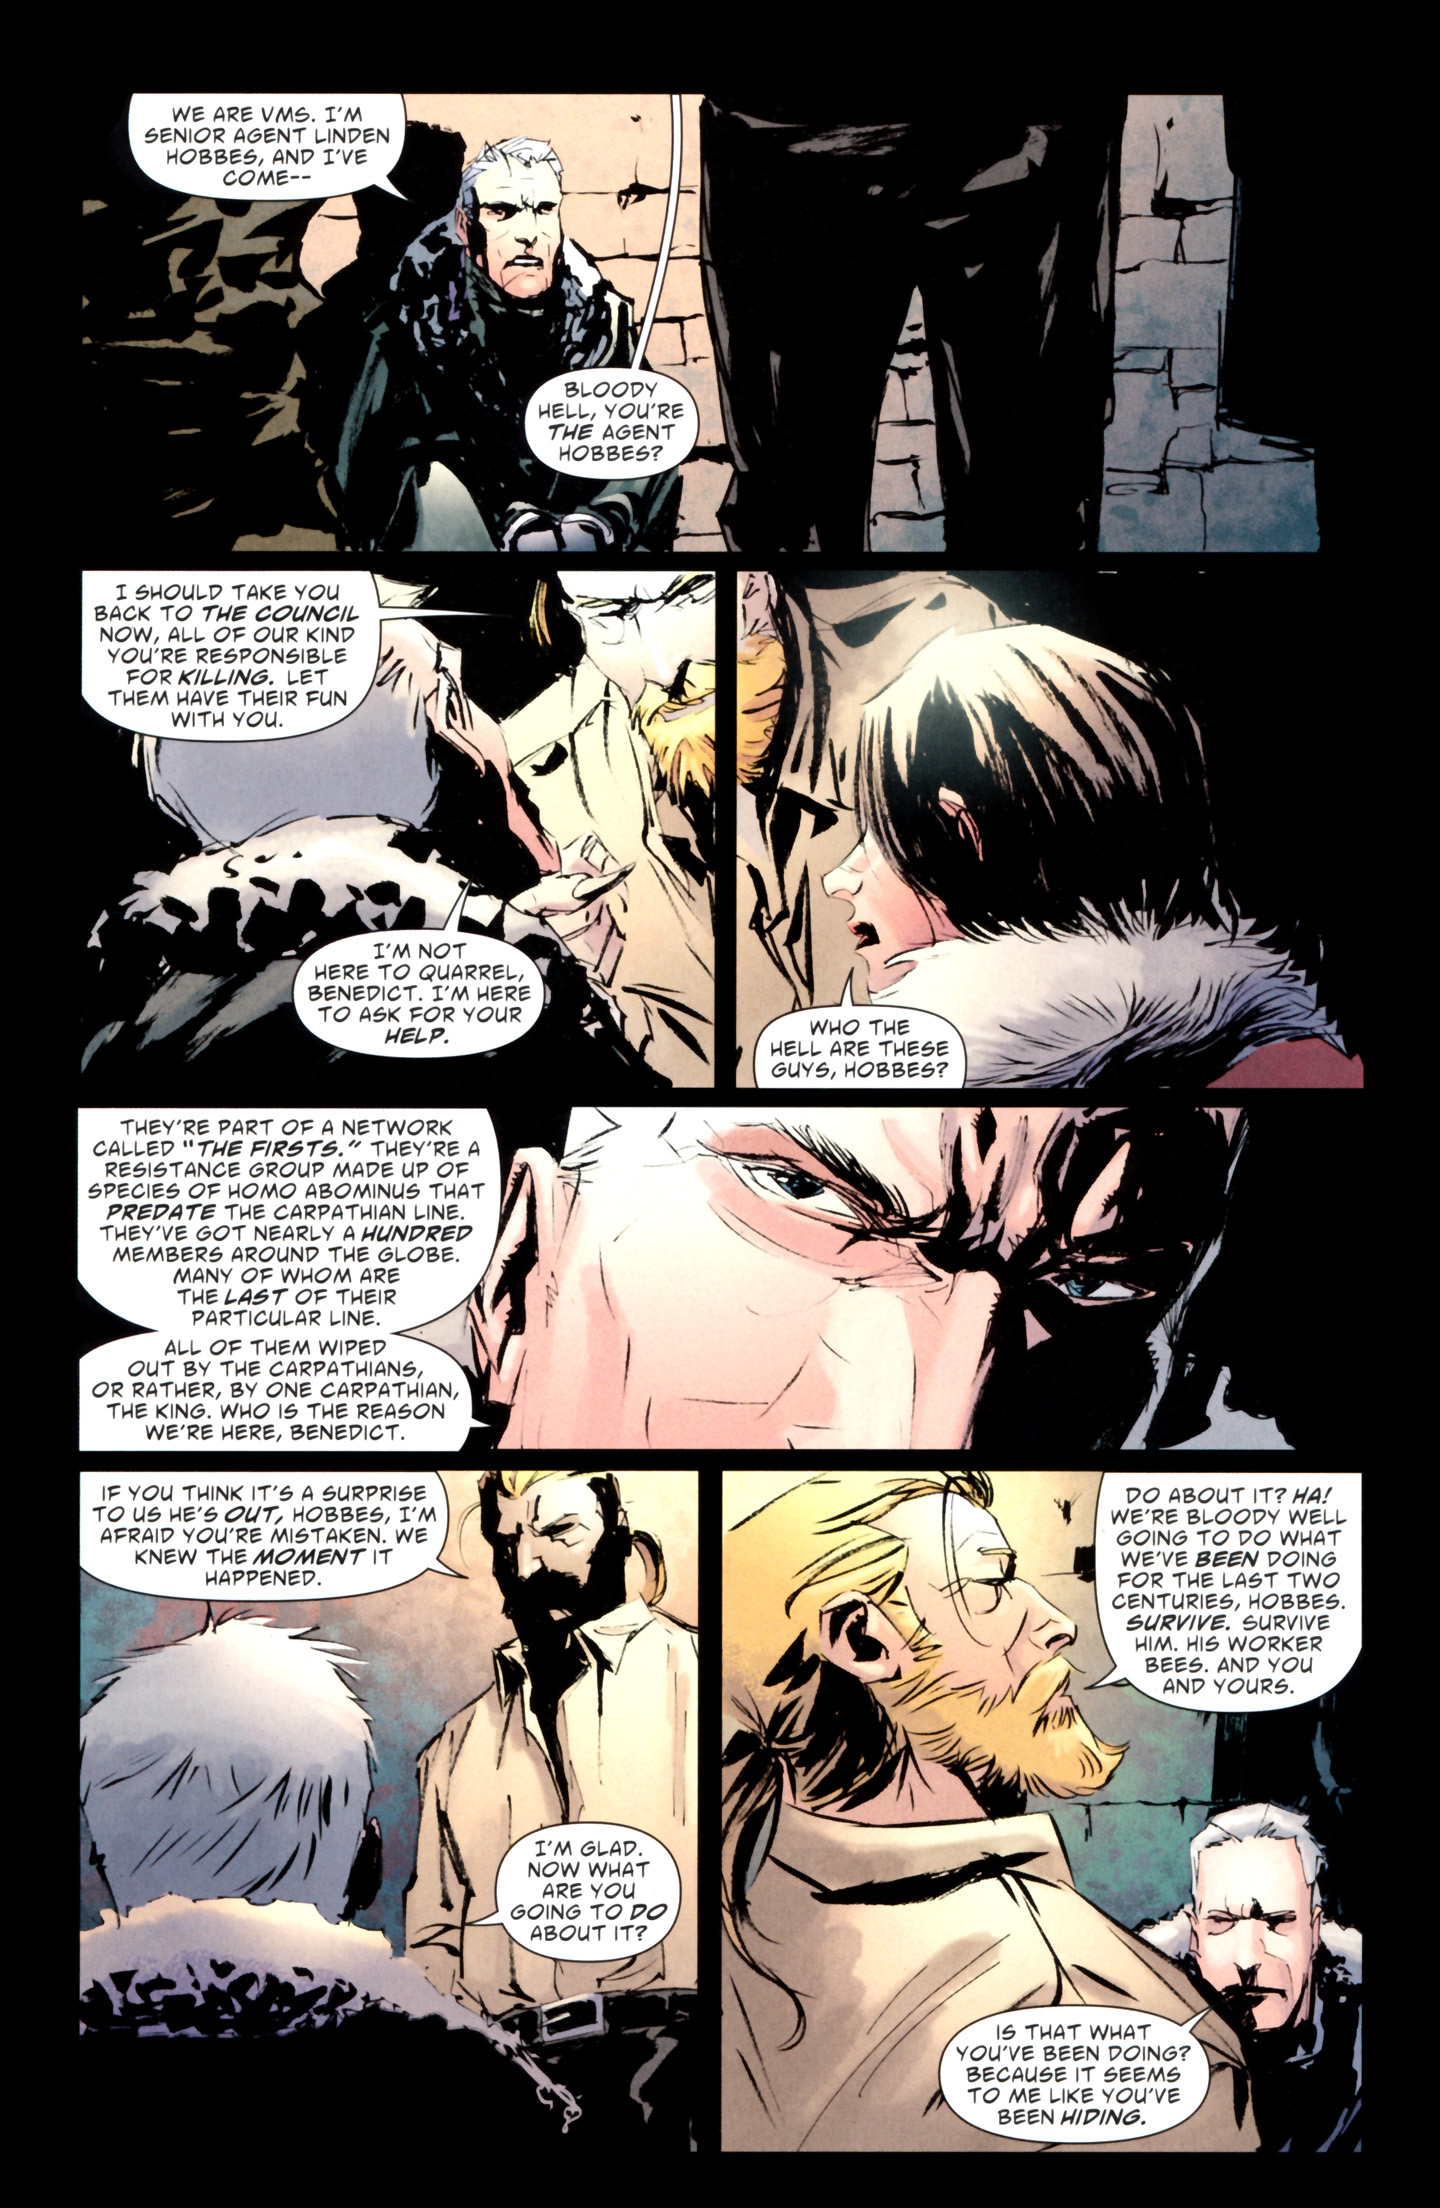 Read online American Vampire: Lord of Nightmares comic -  Issue #3 - 27